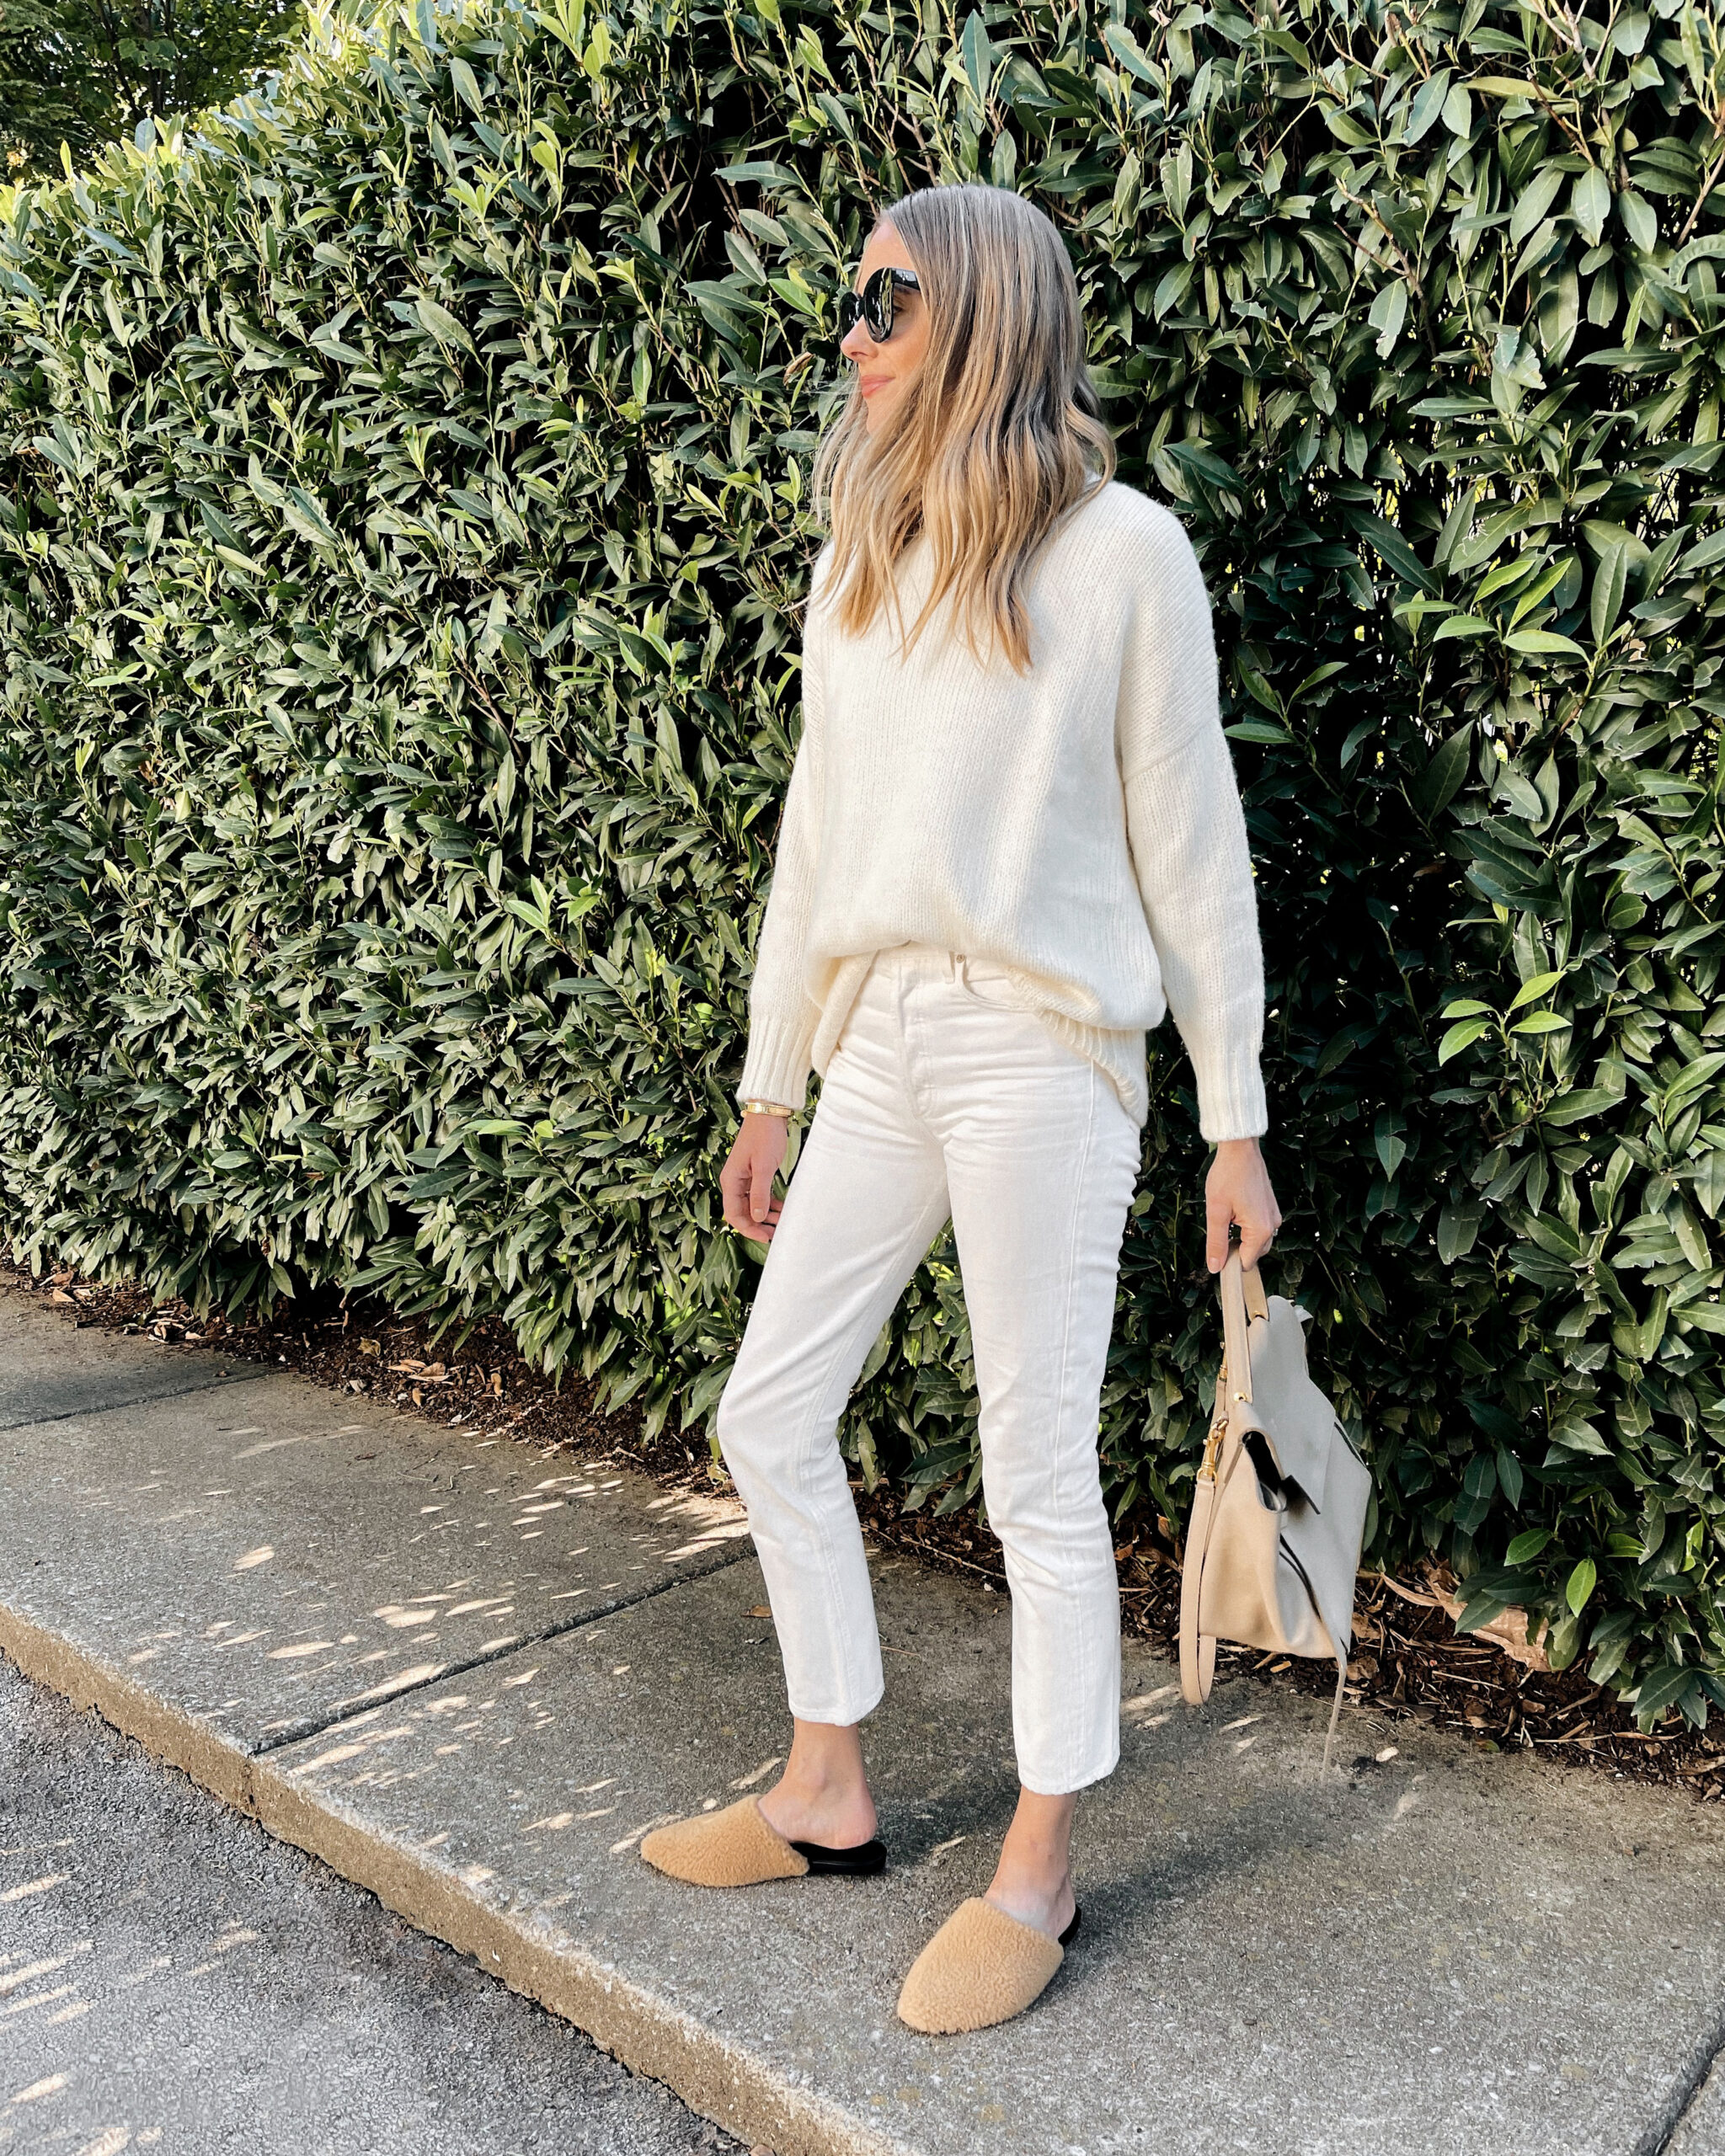 Fashion Jackson Wearing Jenni Kayne White Sweater White Jeans Beige Mules Celine Belt Bag